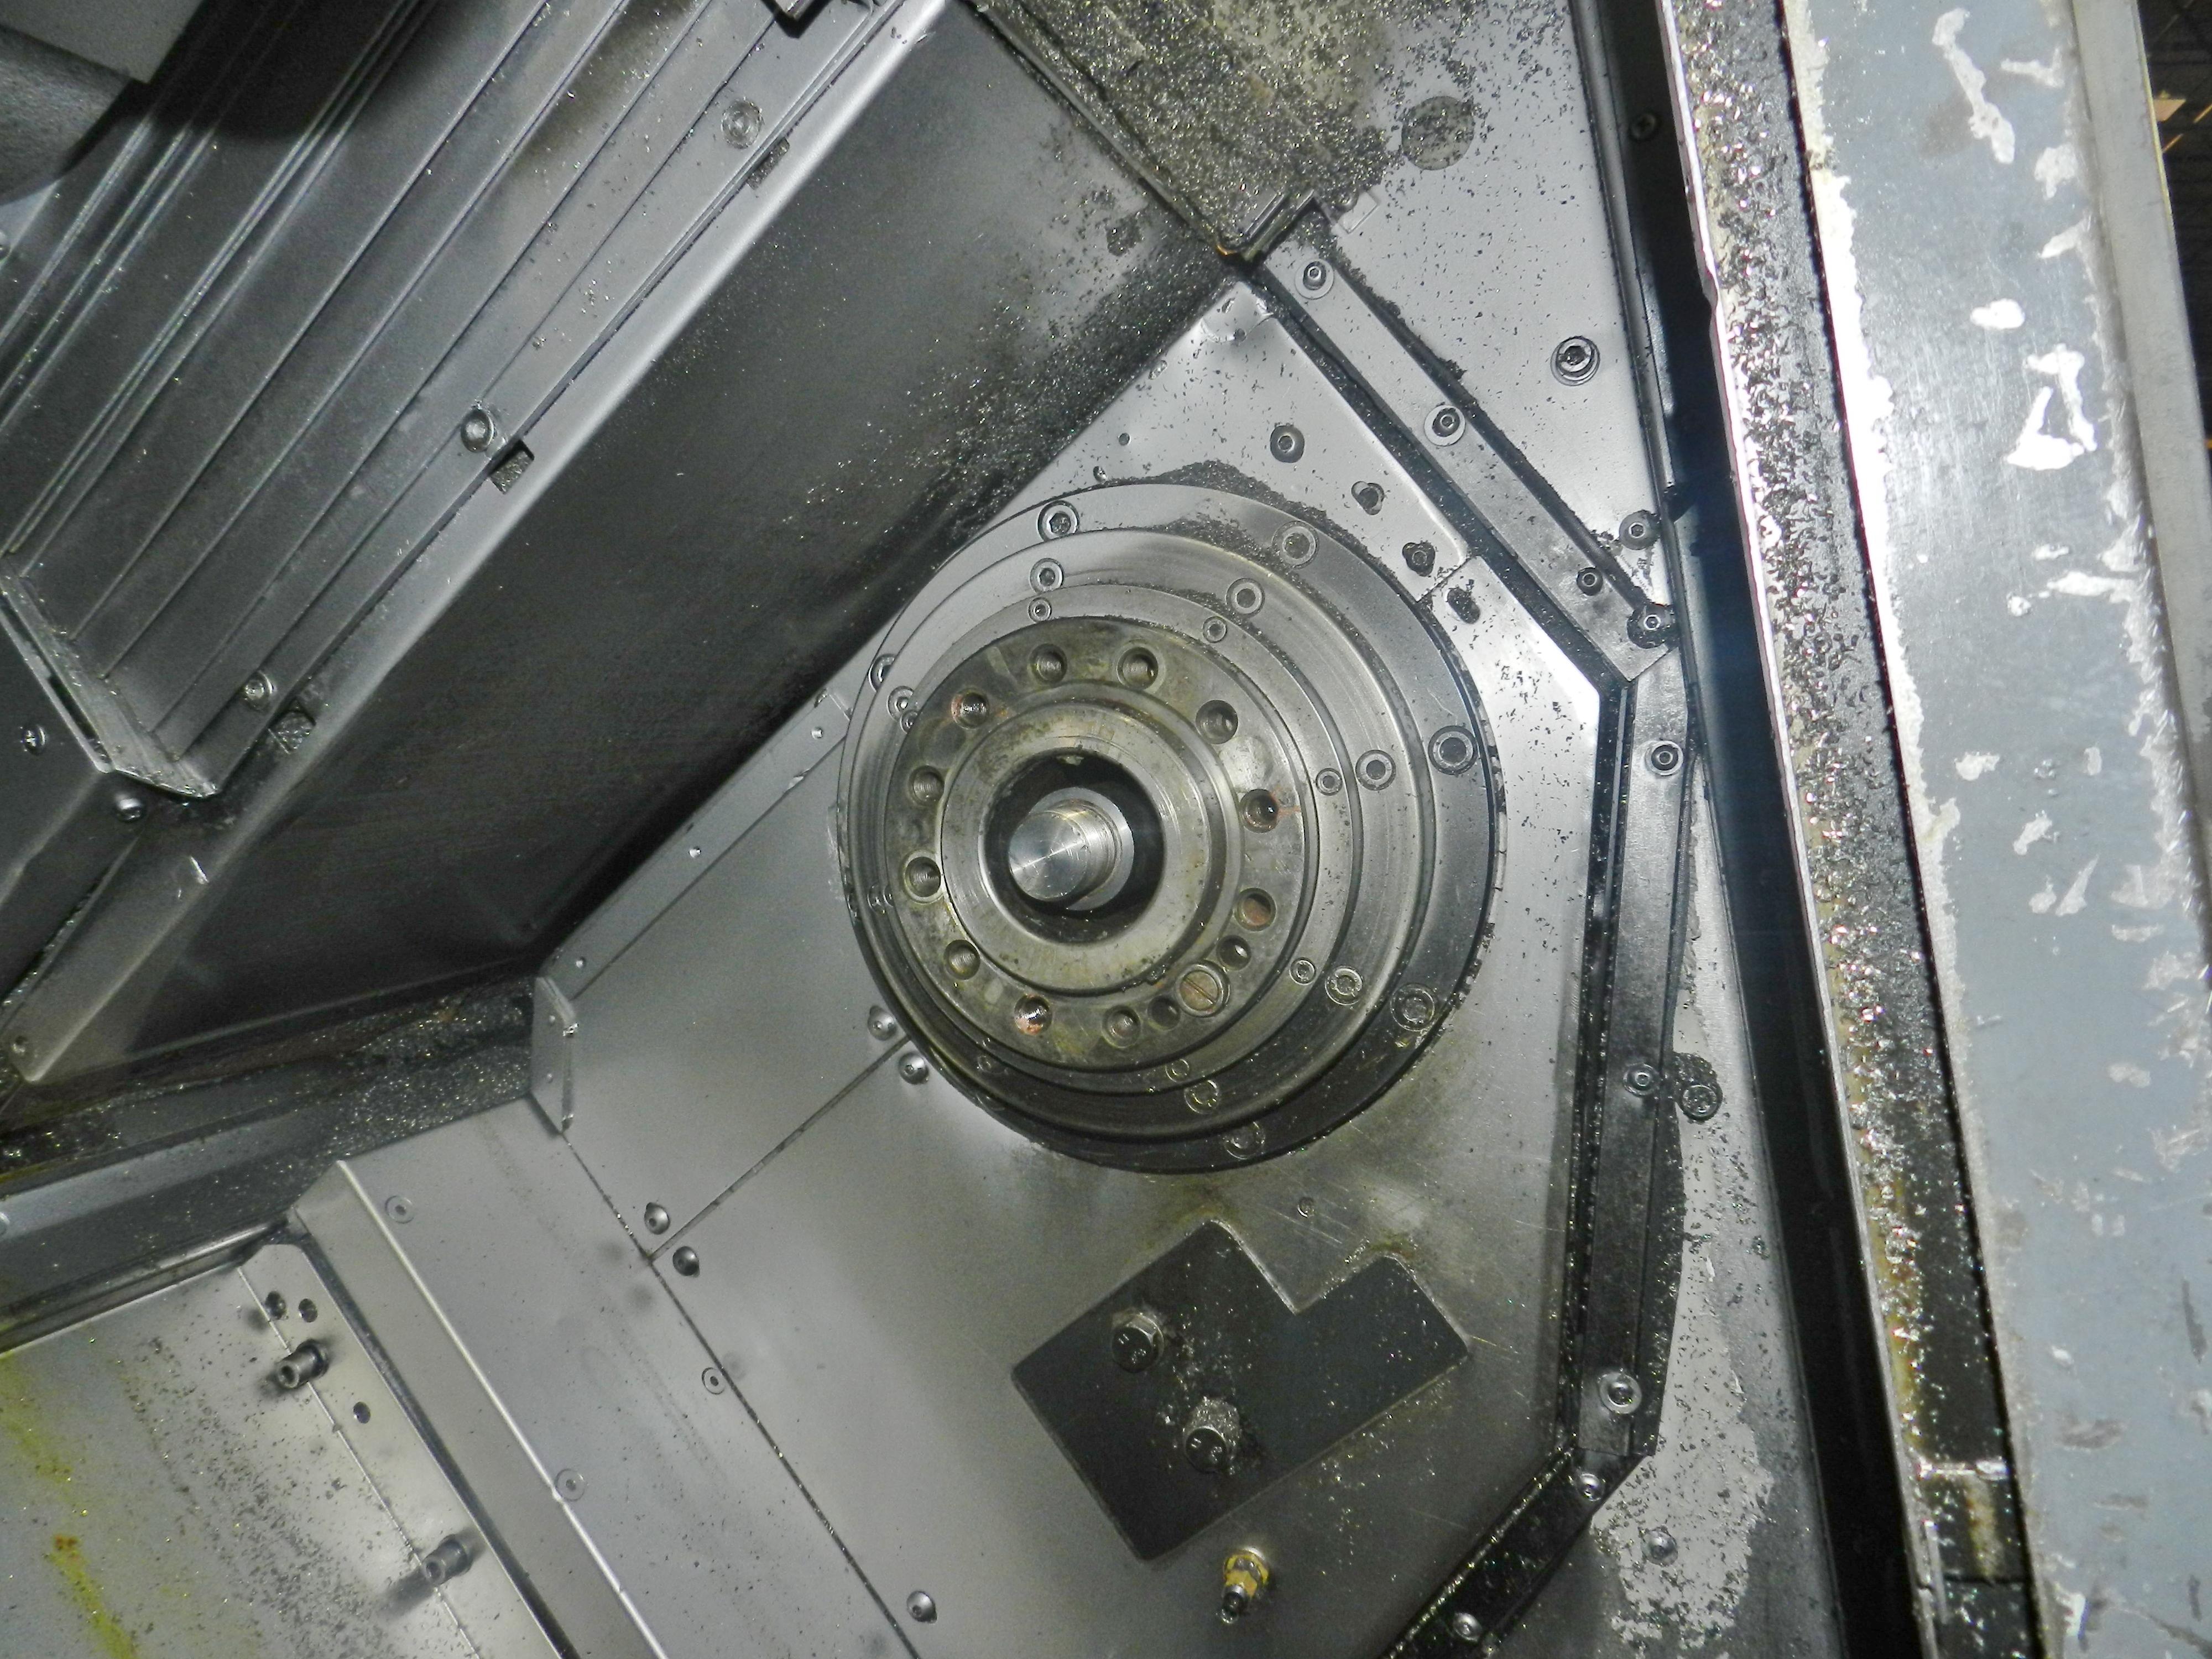 Mori Seiki DL-20 CNC Lathe - Image 4 of 12